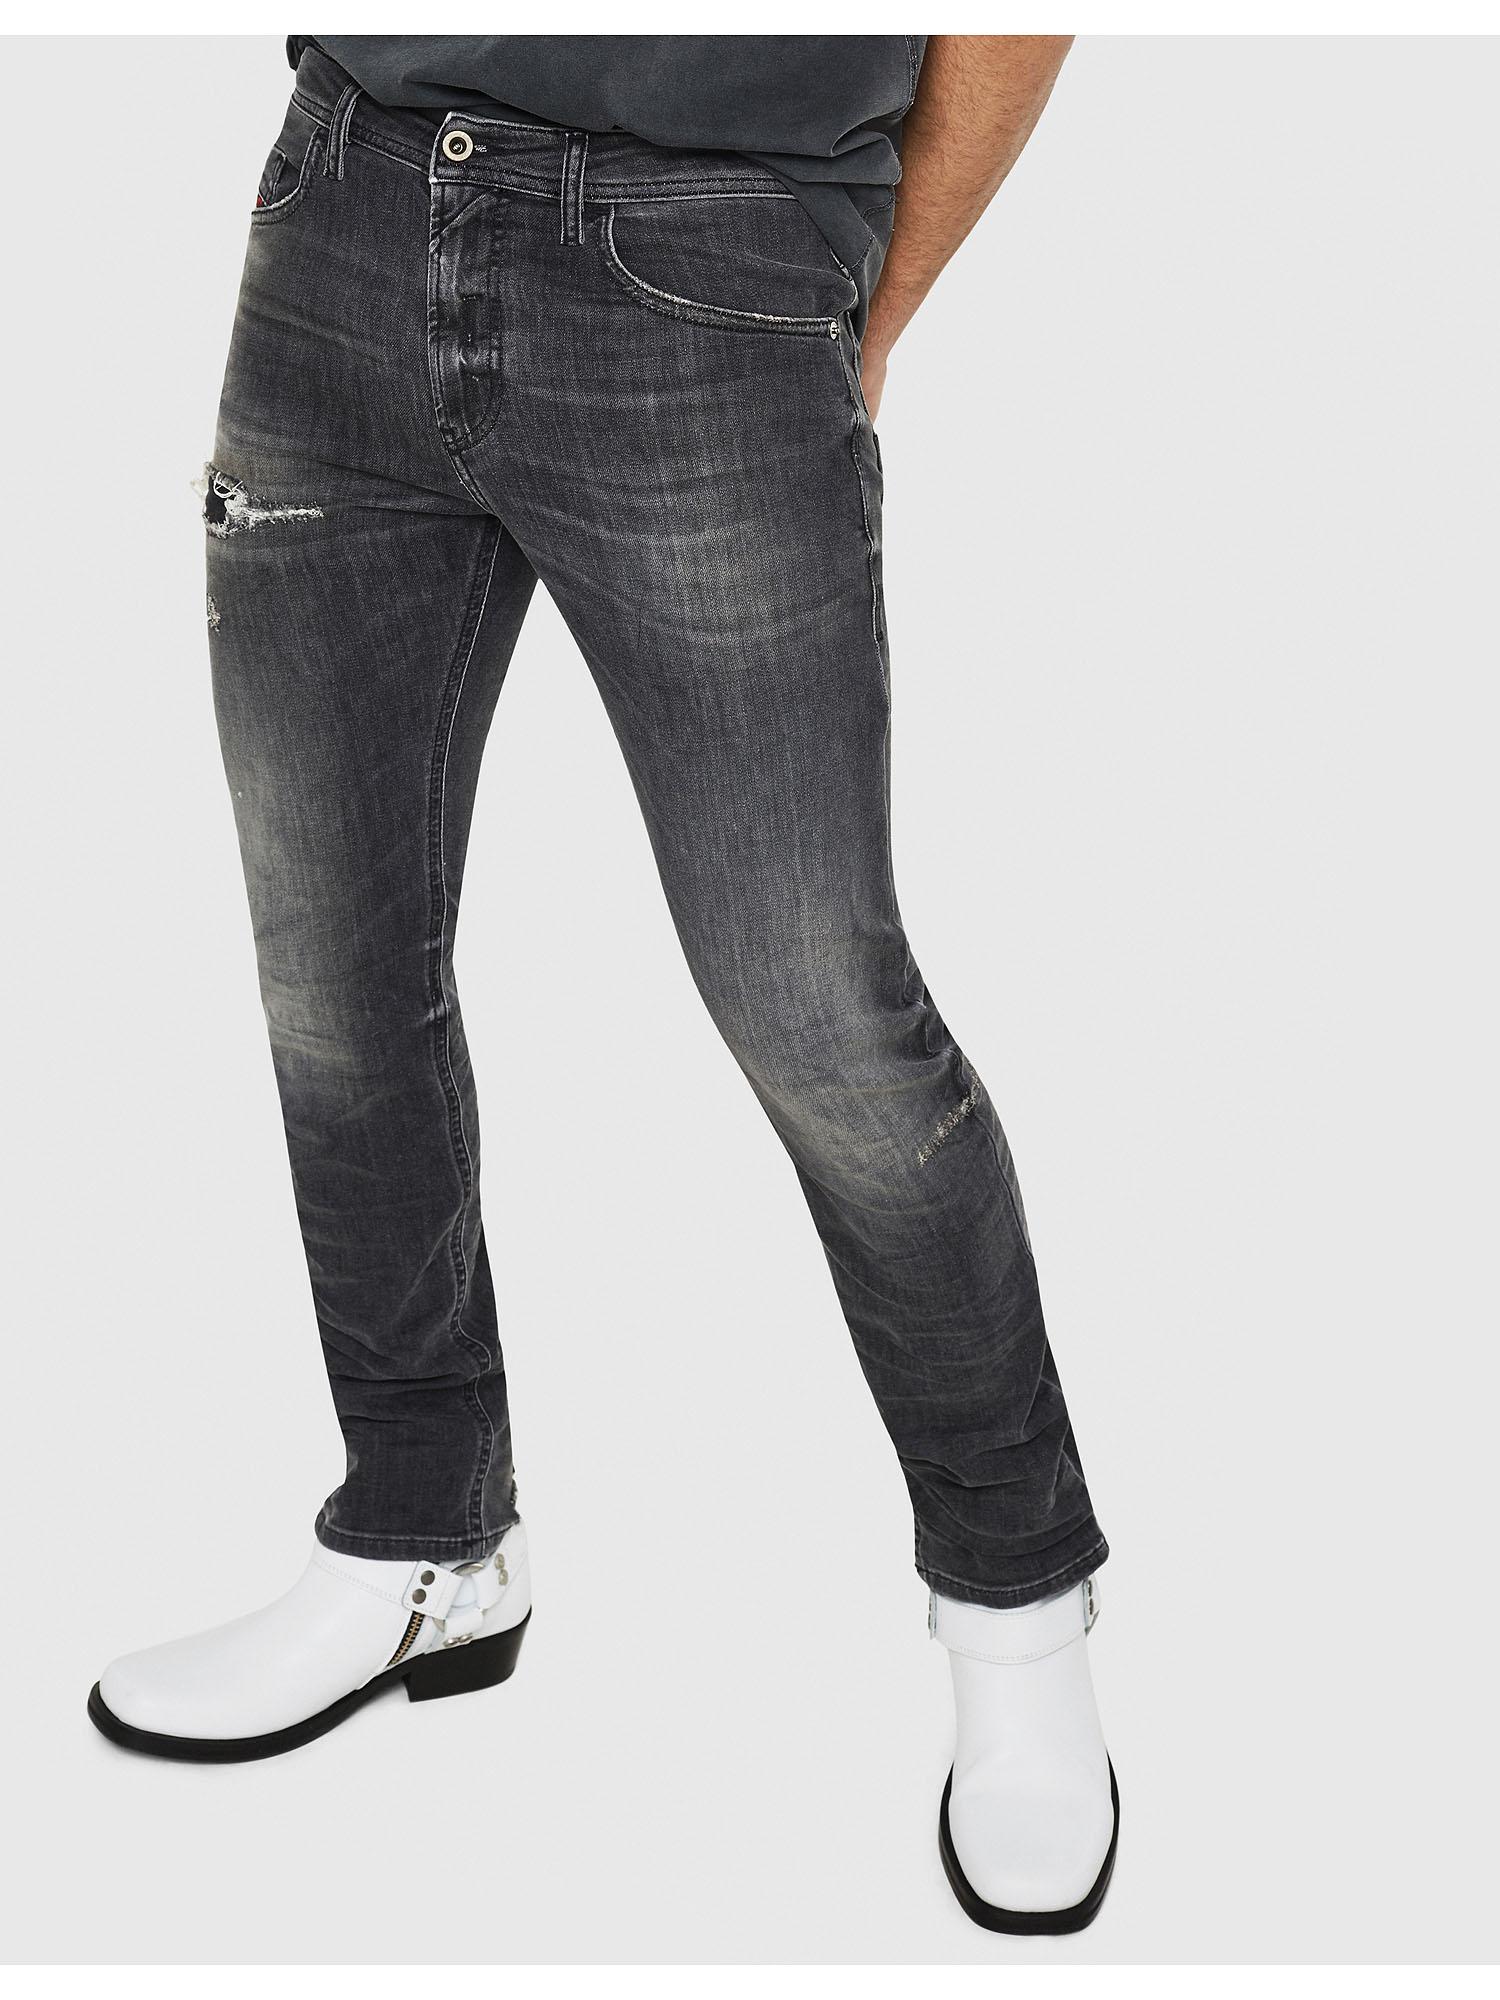 1b4e4fa6cce3 THOMMER 069DM Herren: Slim Jeans Schwarz/Dunkelgrau | Diesel